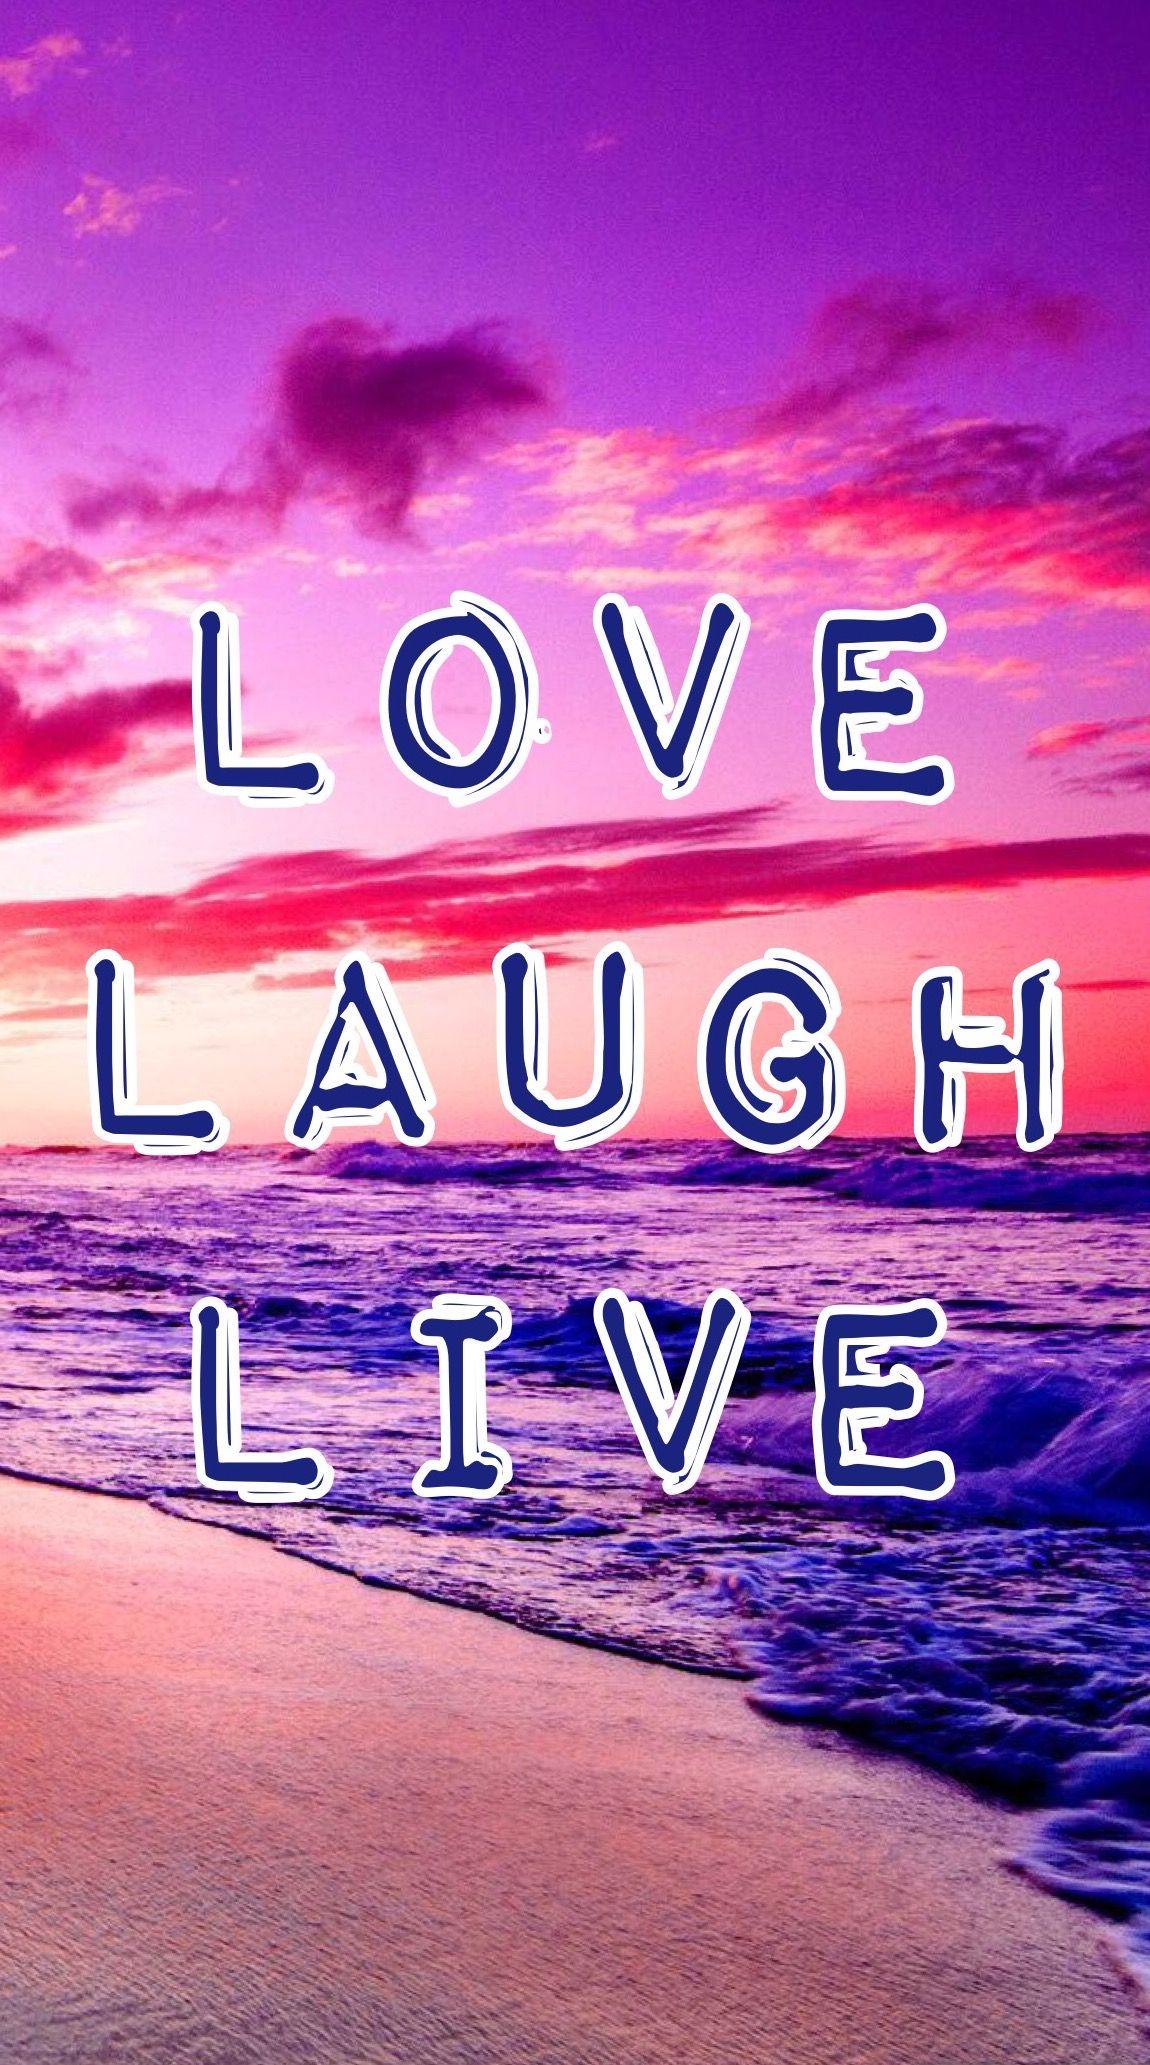 Love Laugh Live Lockscreen By Me Love Laugh Quotes Live Laugh Love Live Laugh Love Quotes Galaxy live laugh love wallpaper